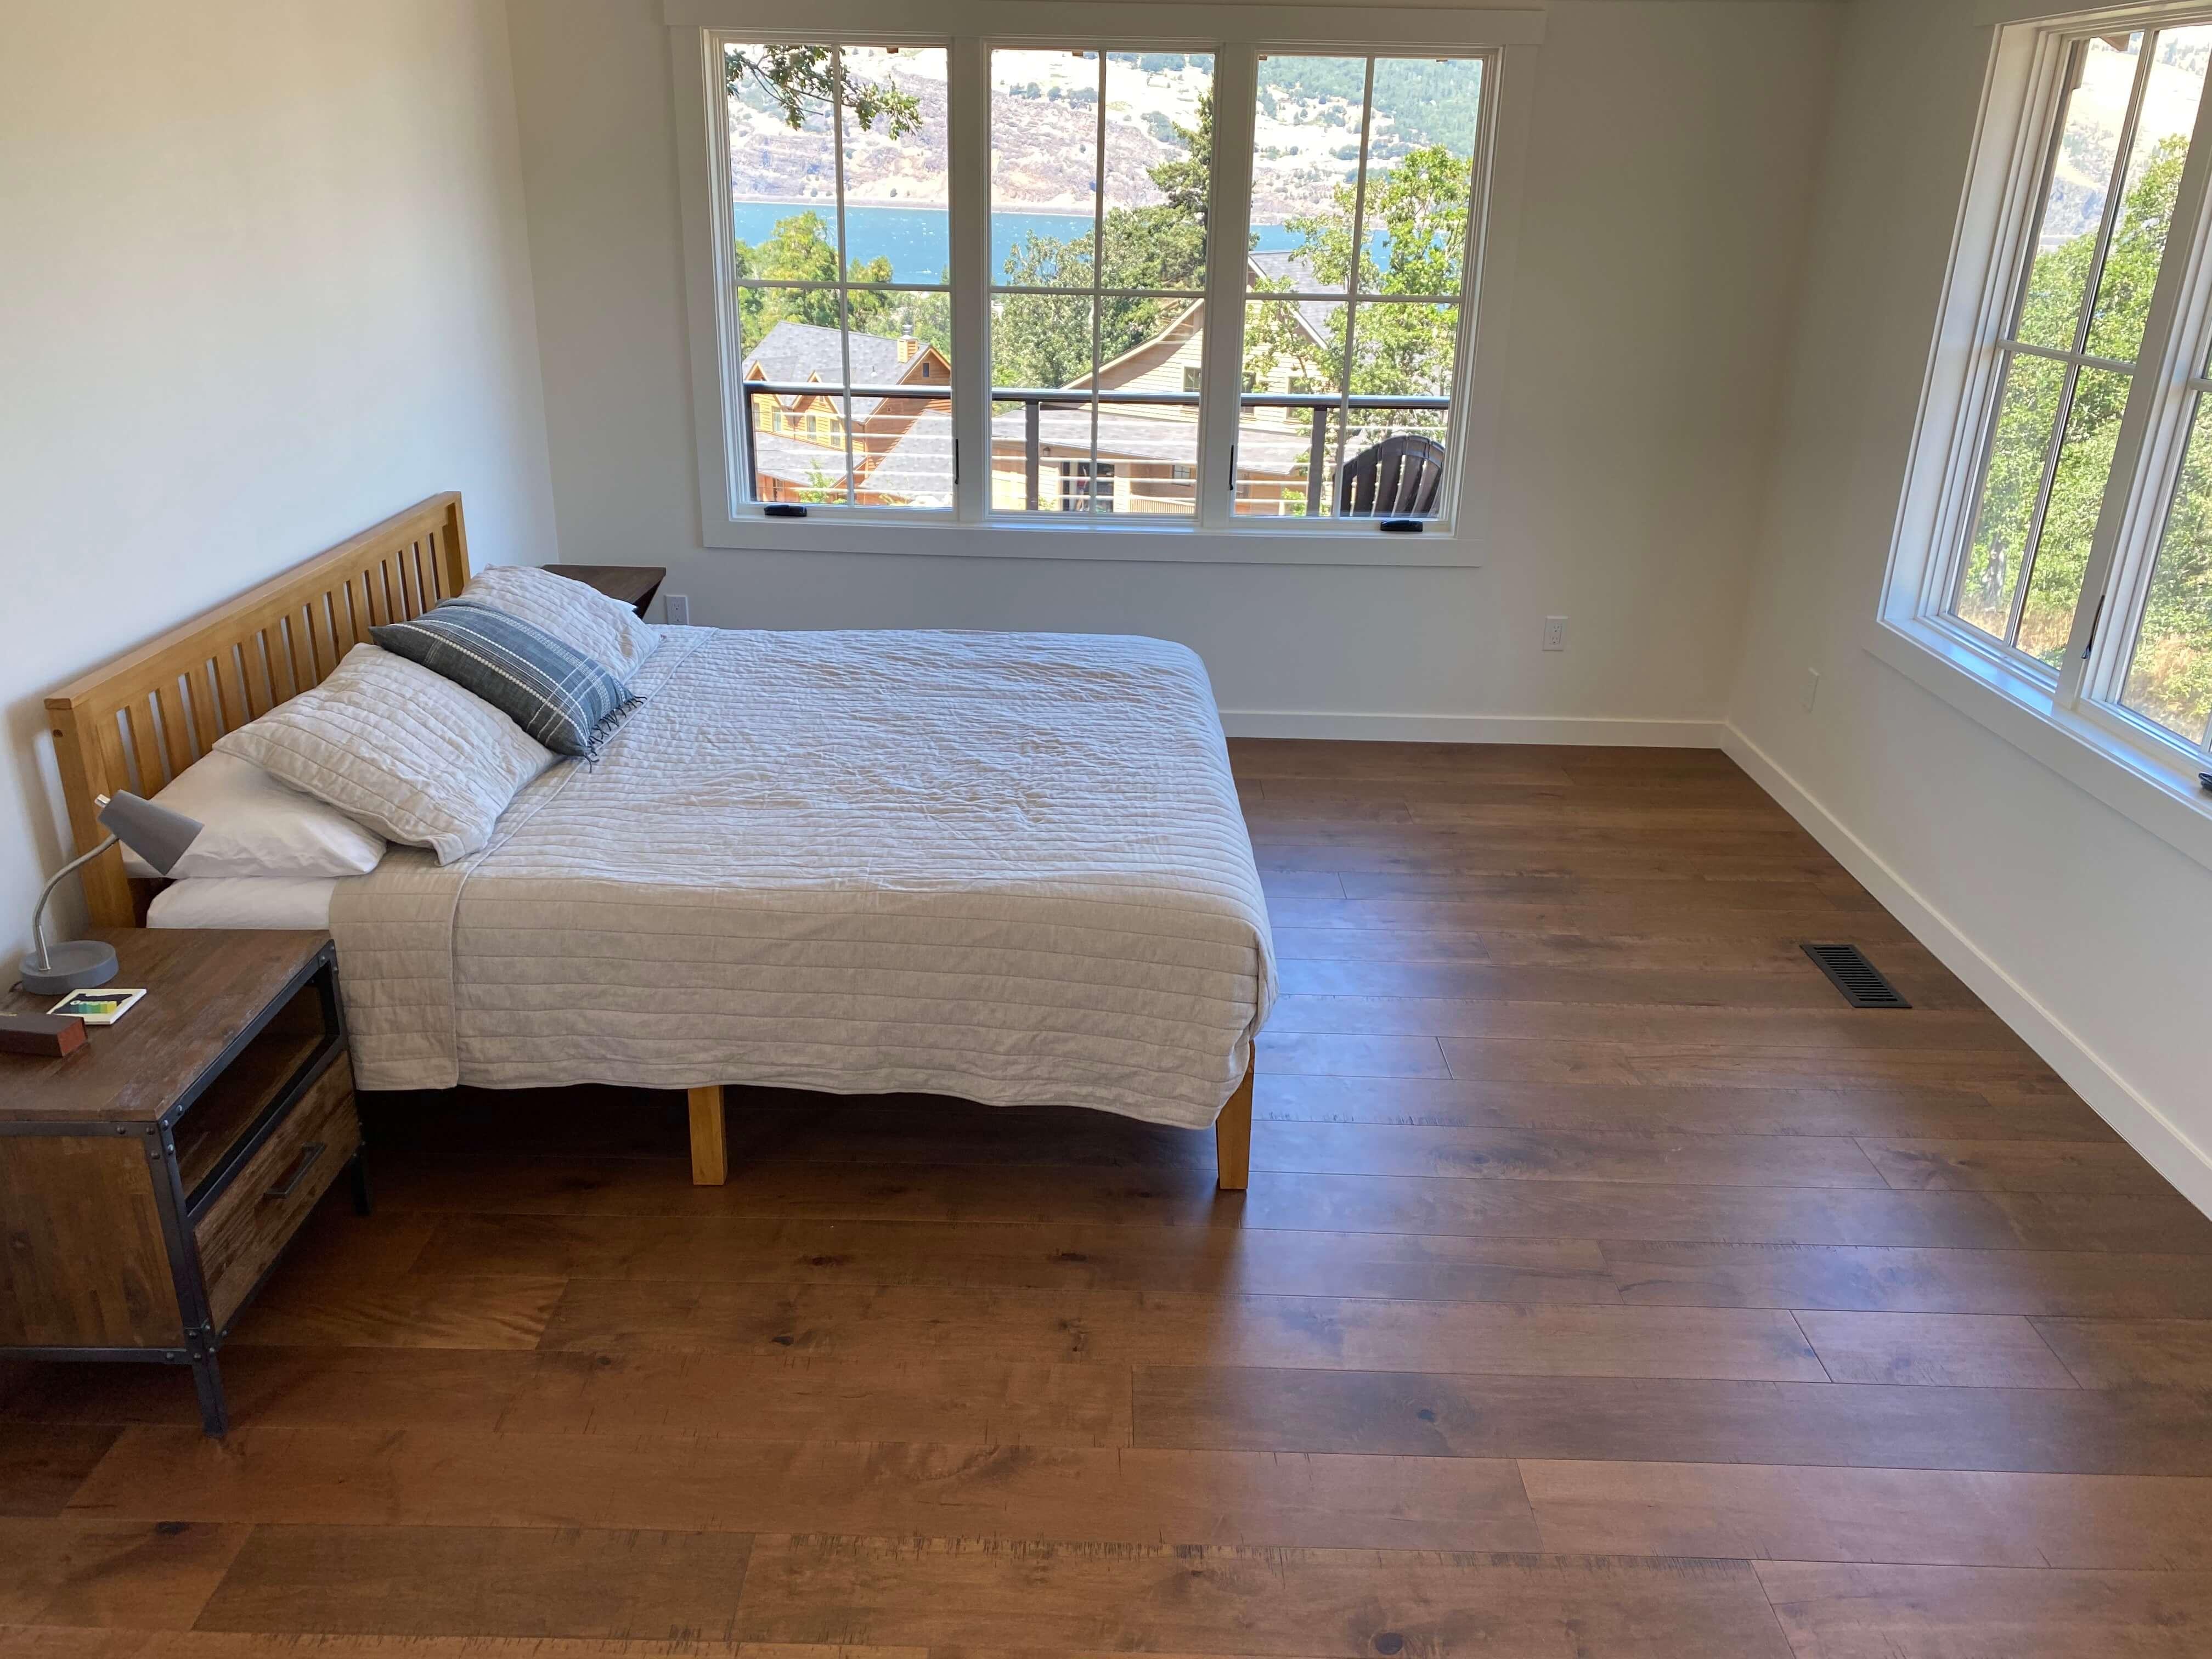 Luxury Vinyl Plank Flooring in Bedroom